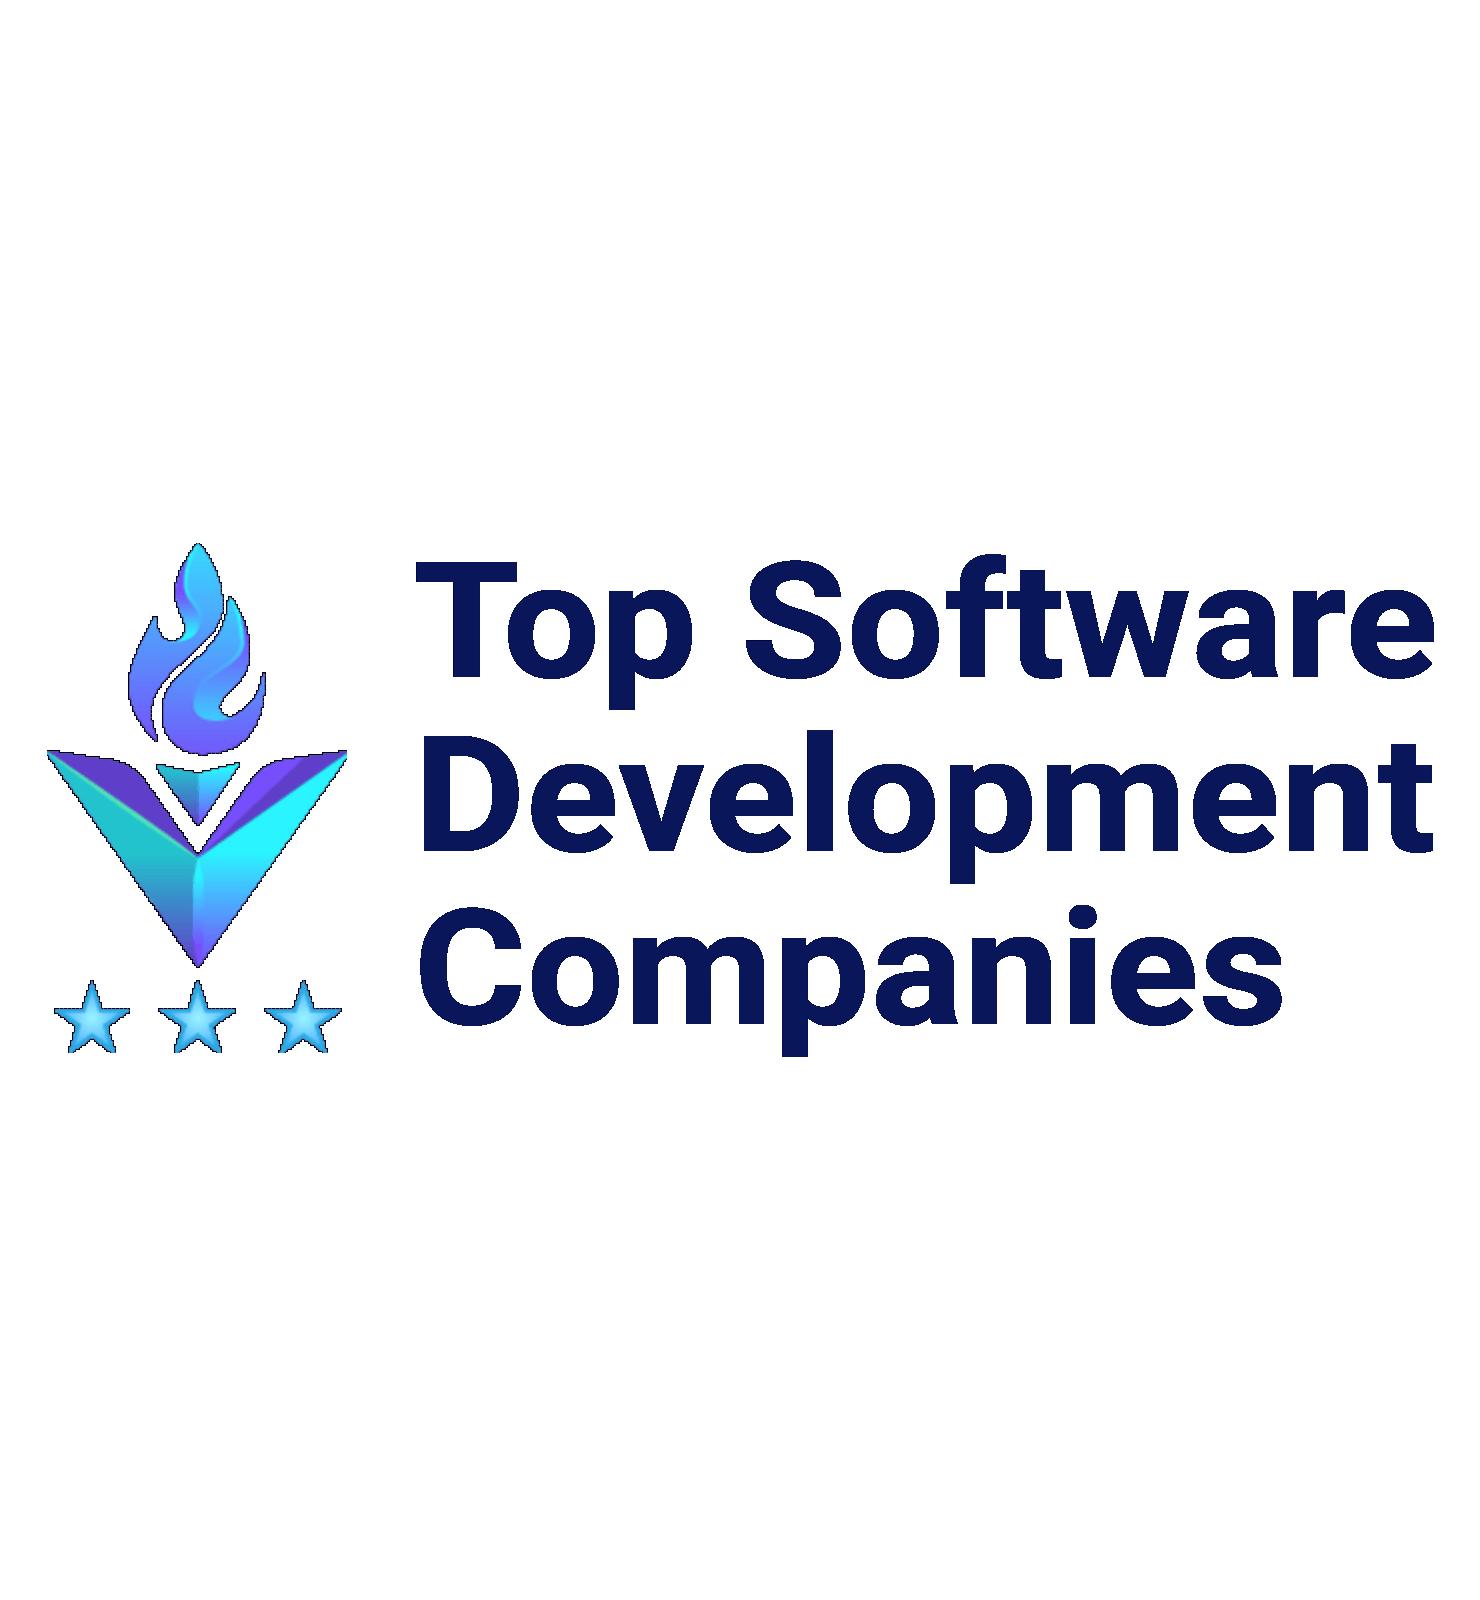 Top Software Development Companies